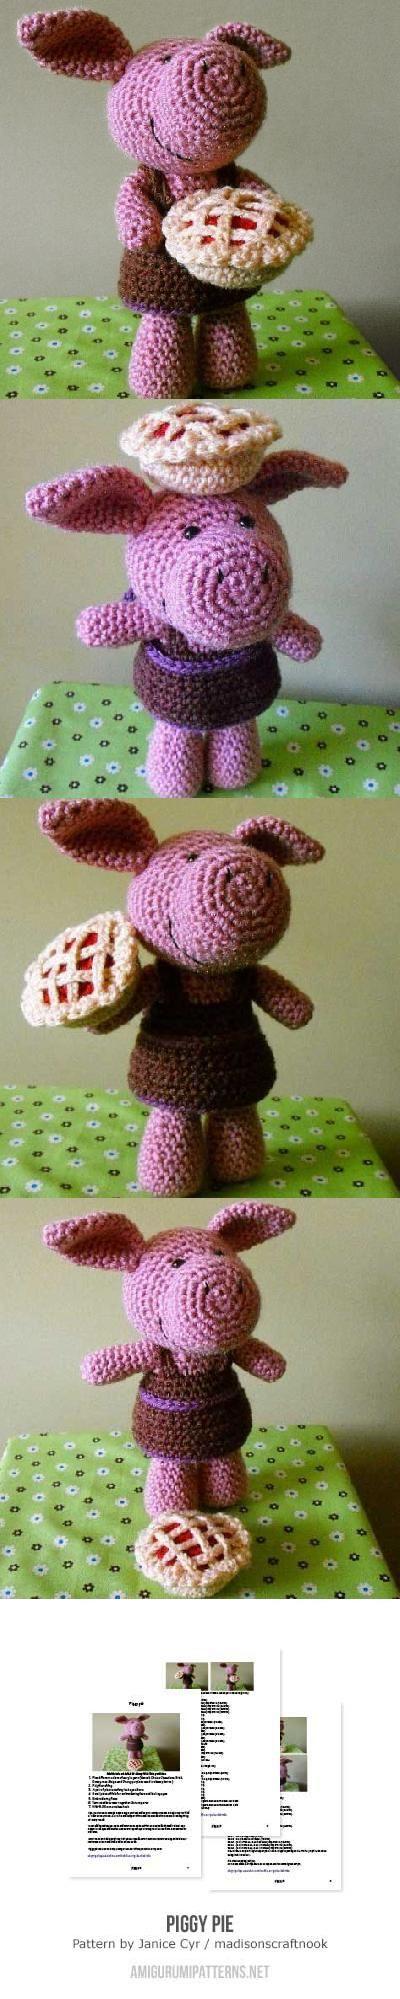 Piggy Pie amigurumi pattern by Janice Cyr / madisonscraftnook